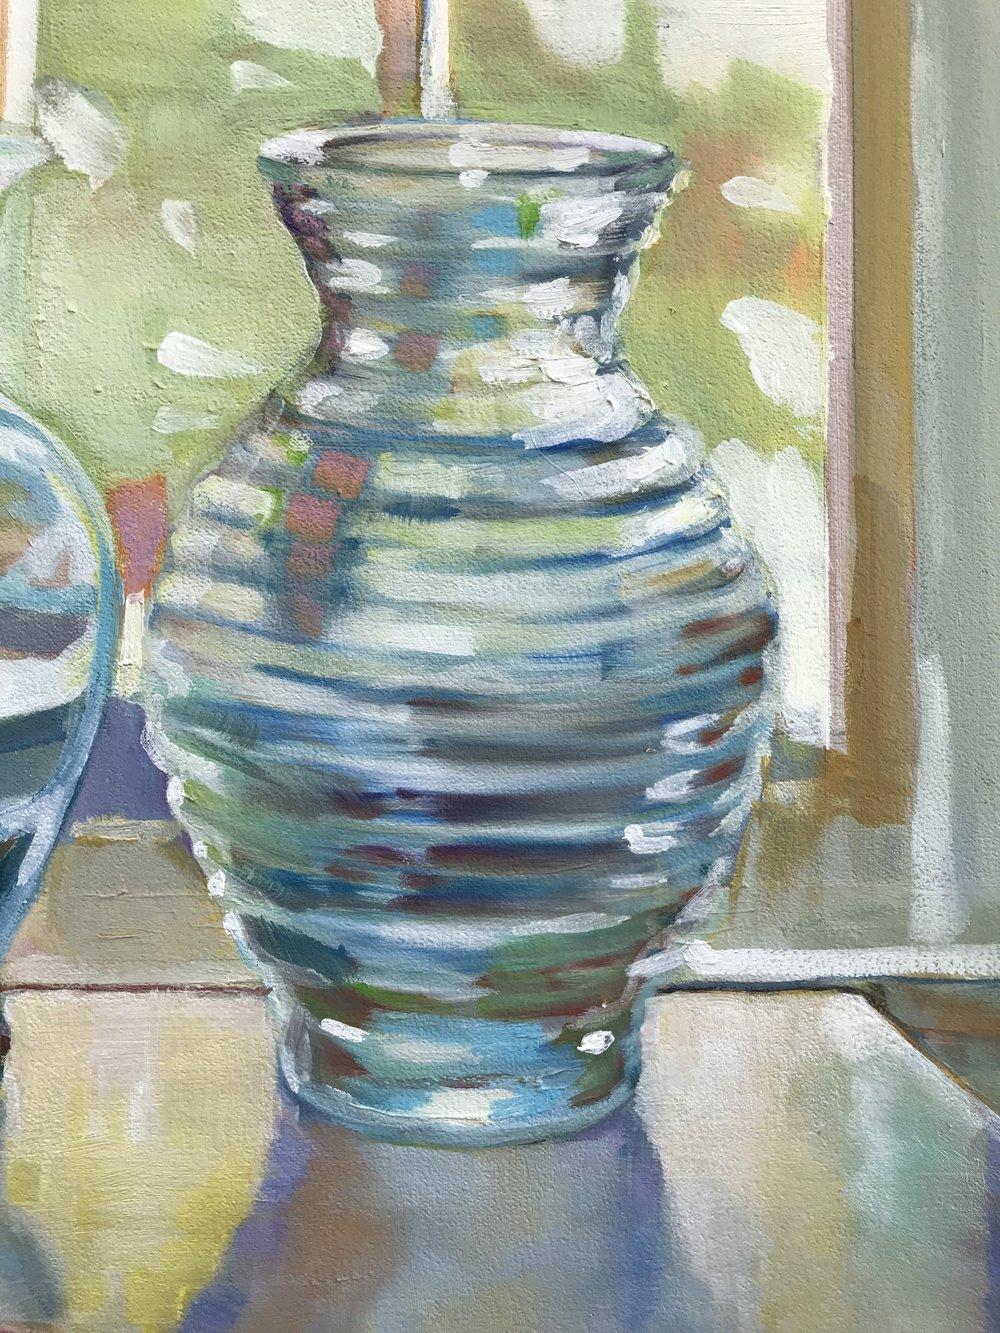 vase 2 detail.jpeg